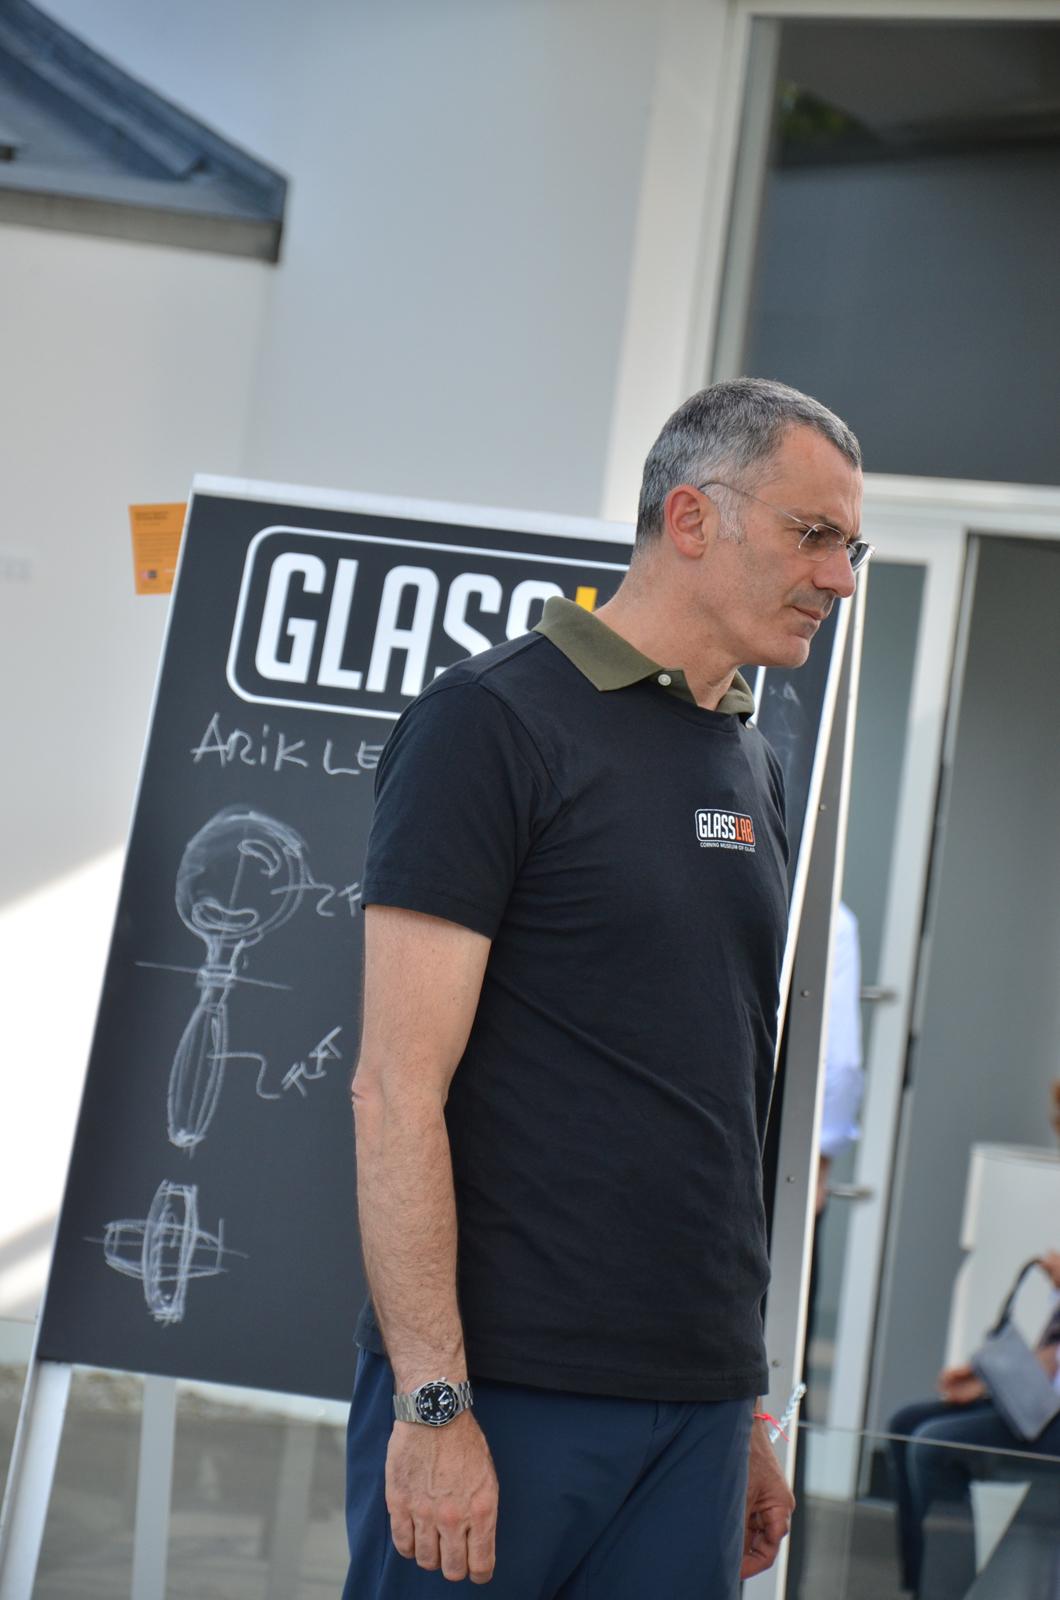 Designer Arik Levy at GlassLab Vitra Design Museum, Art Basel 2011